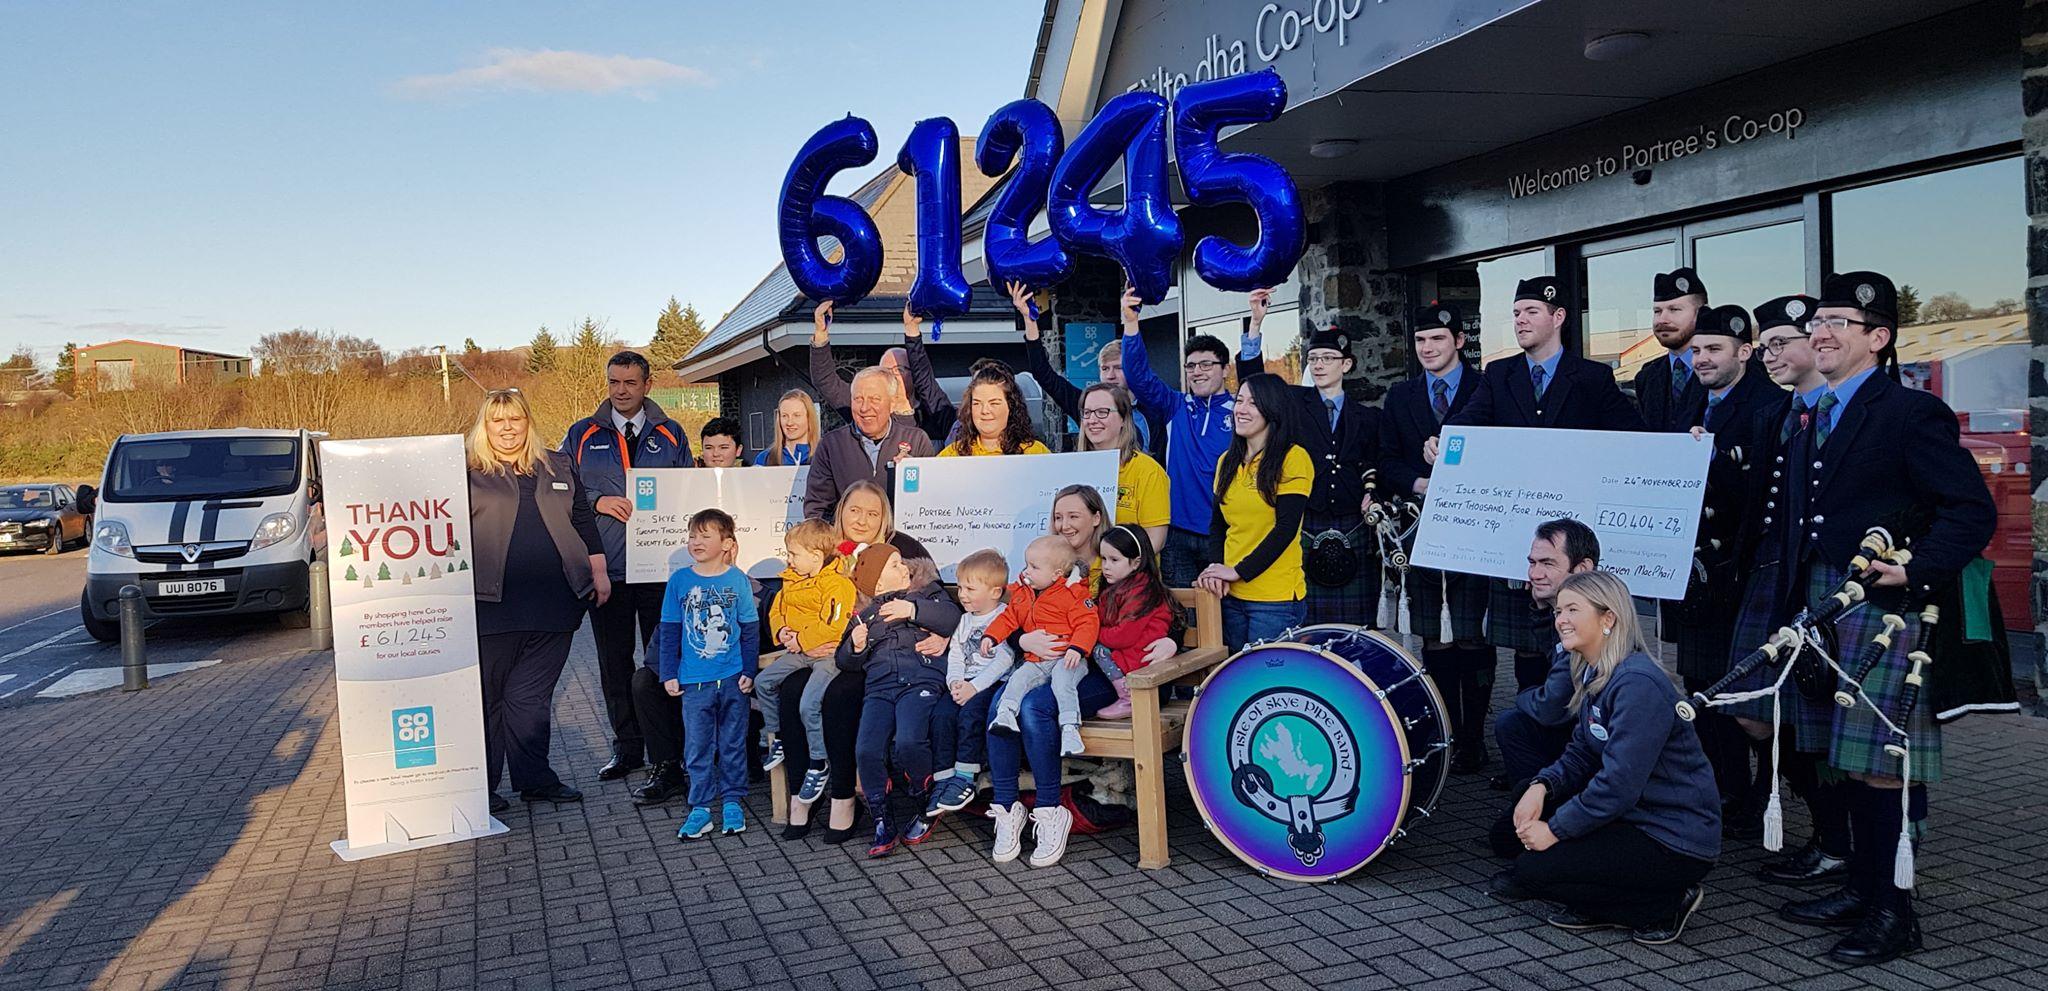 Skye Camanachd Benefit From Co-op Local Community Fund